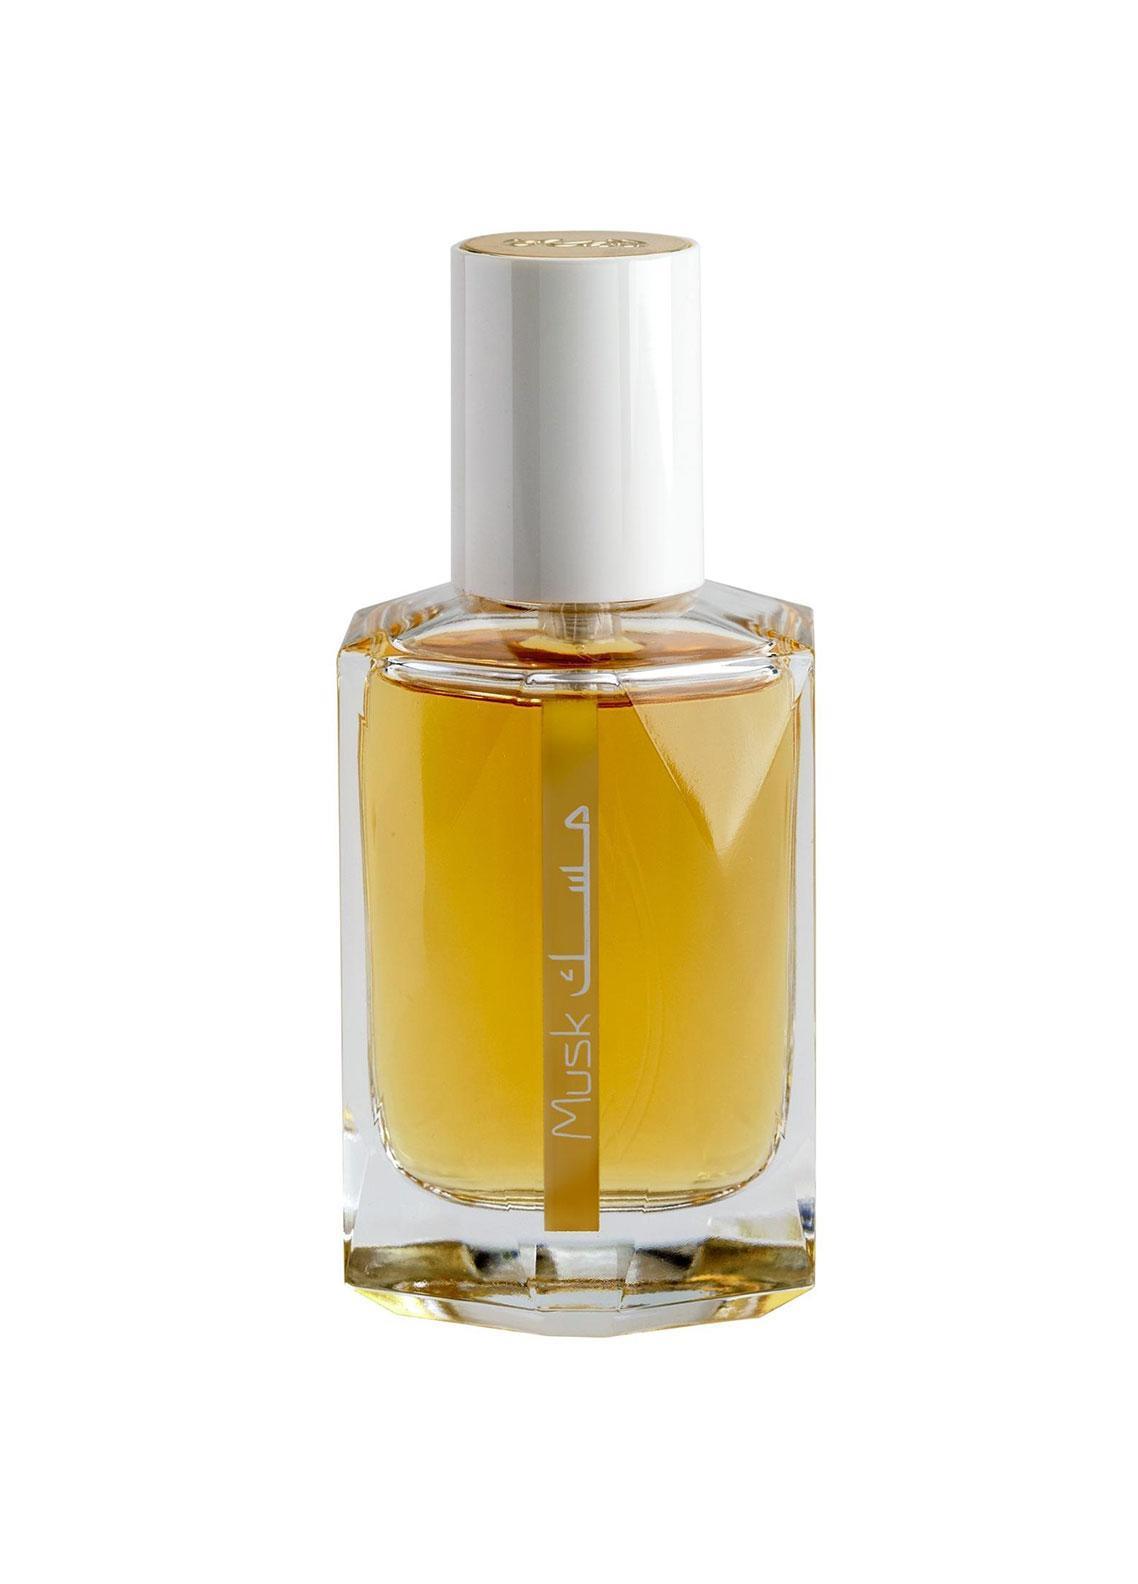 Rasasi Rasasi Musk Hareer men's perfume EDP